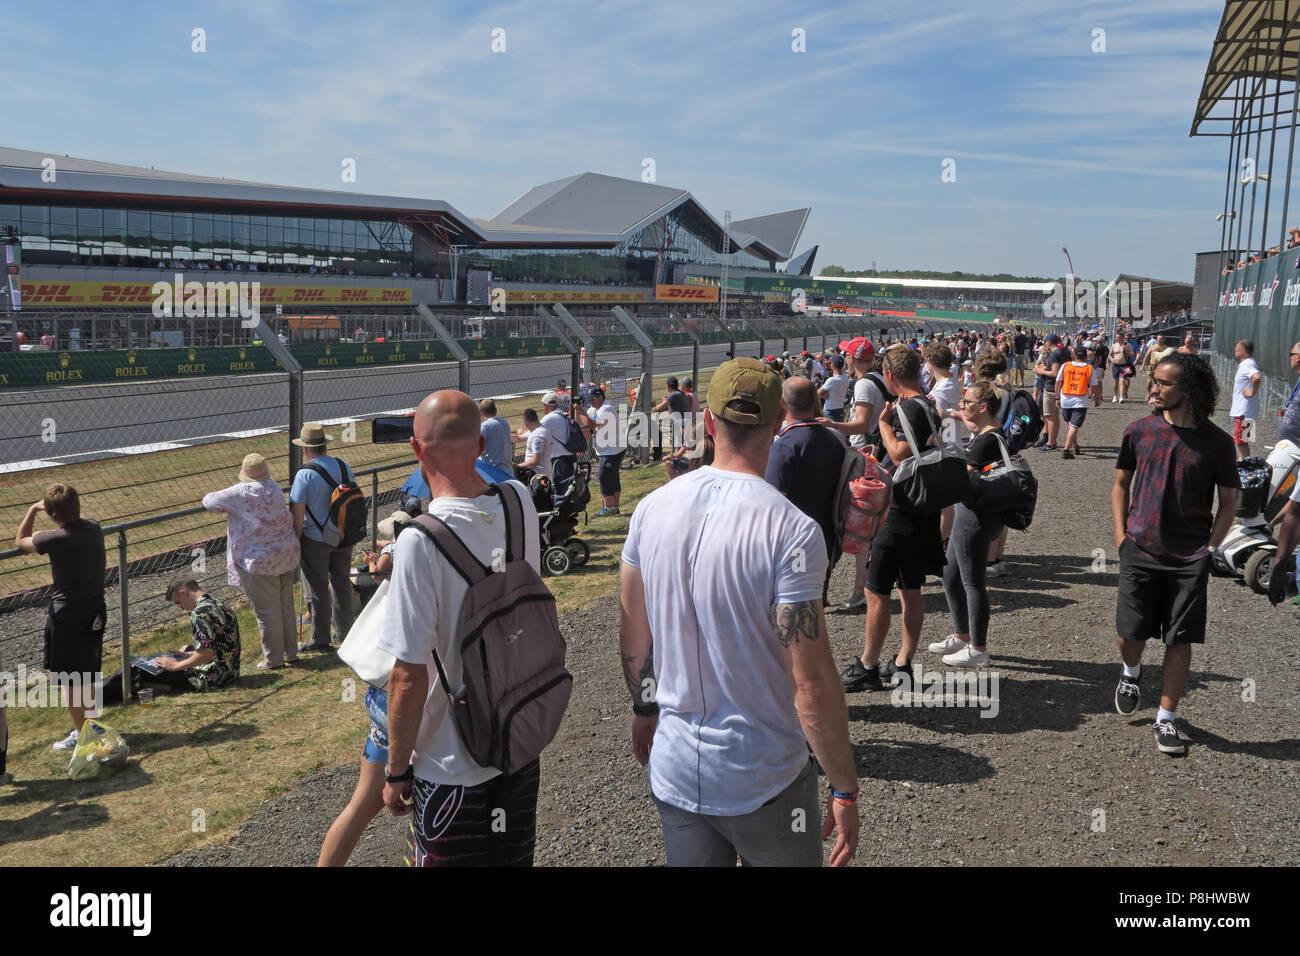 @HotpixUK,GoTonySmith,Silverstone,British GP 2018,British Grand Prix 2018,car,track,people,spectators,spectator,the circuit,circuit,F1,British,sunny,summer,Silverstone Formula One Circuit and general admission spectators,Northamptonshire,West Midlands,England,UK,Circuit,British Grand Prix,F1 Circuit,Formula One,Silverstone Circuit,British Formula 1 Championship